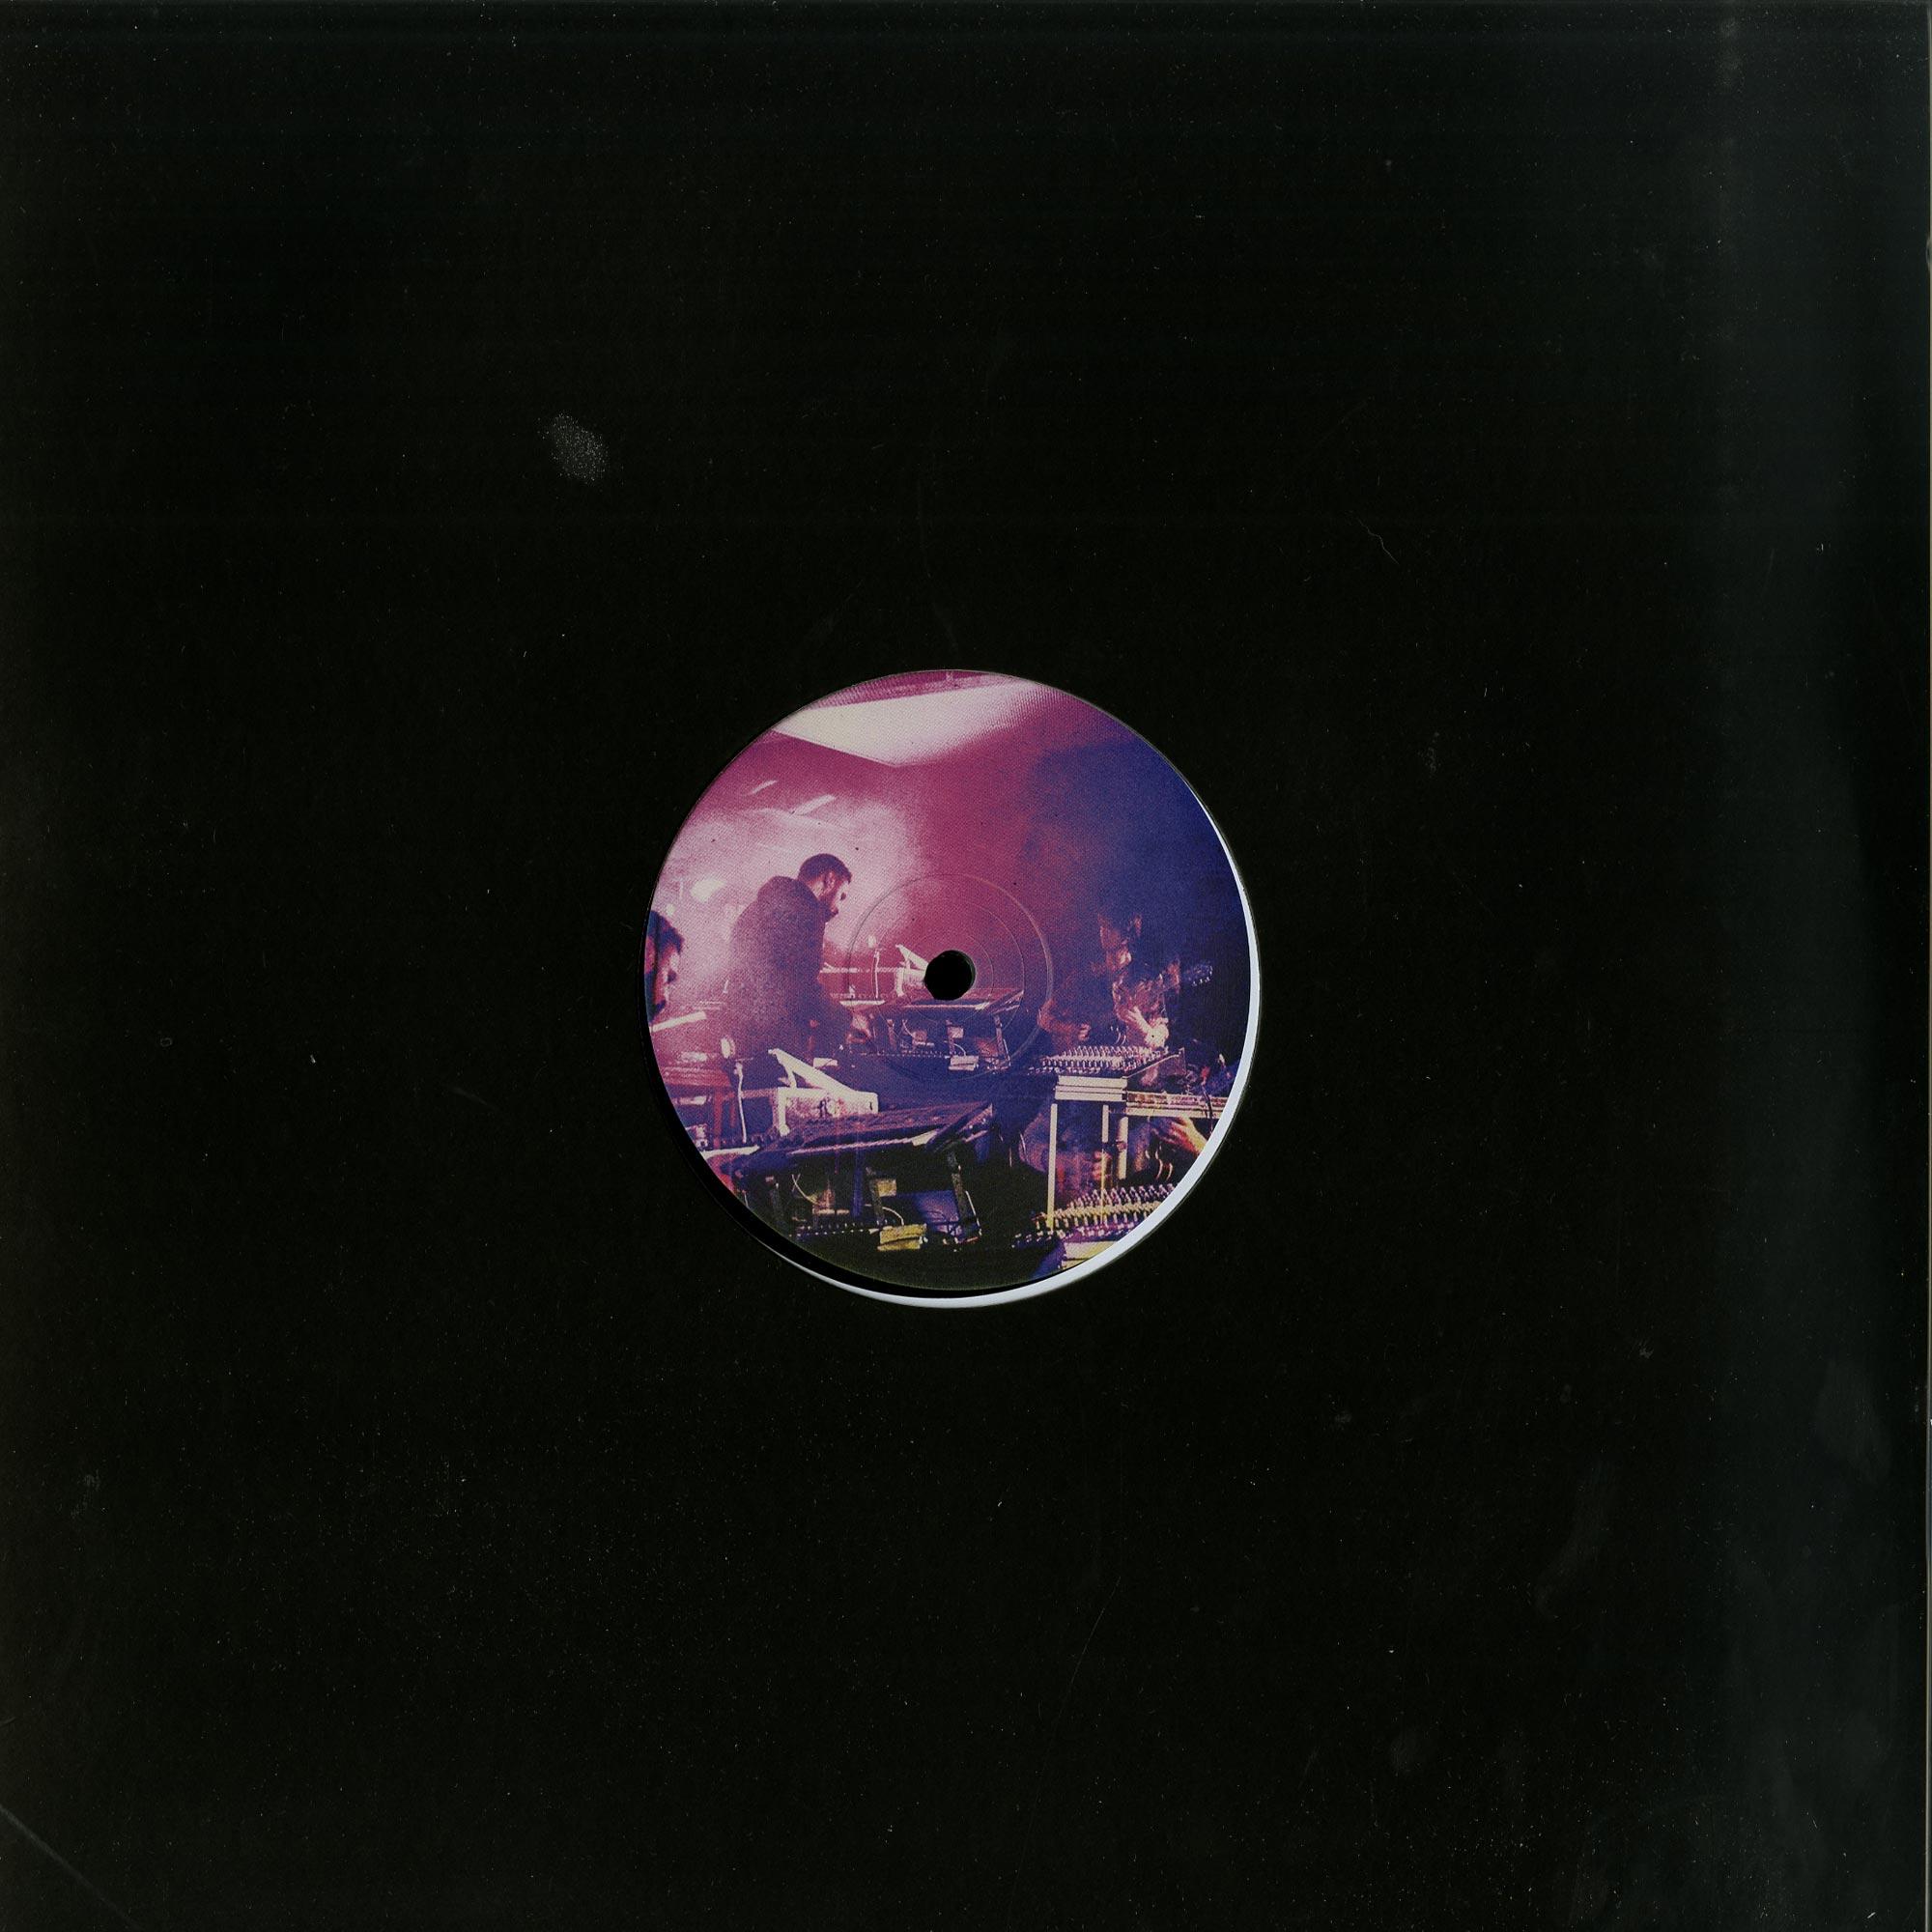 Aybee & Lars Bartkuhn aka The Astral Walkers - PASSAGE EP